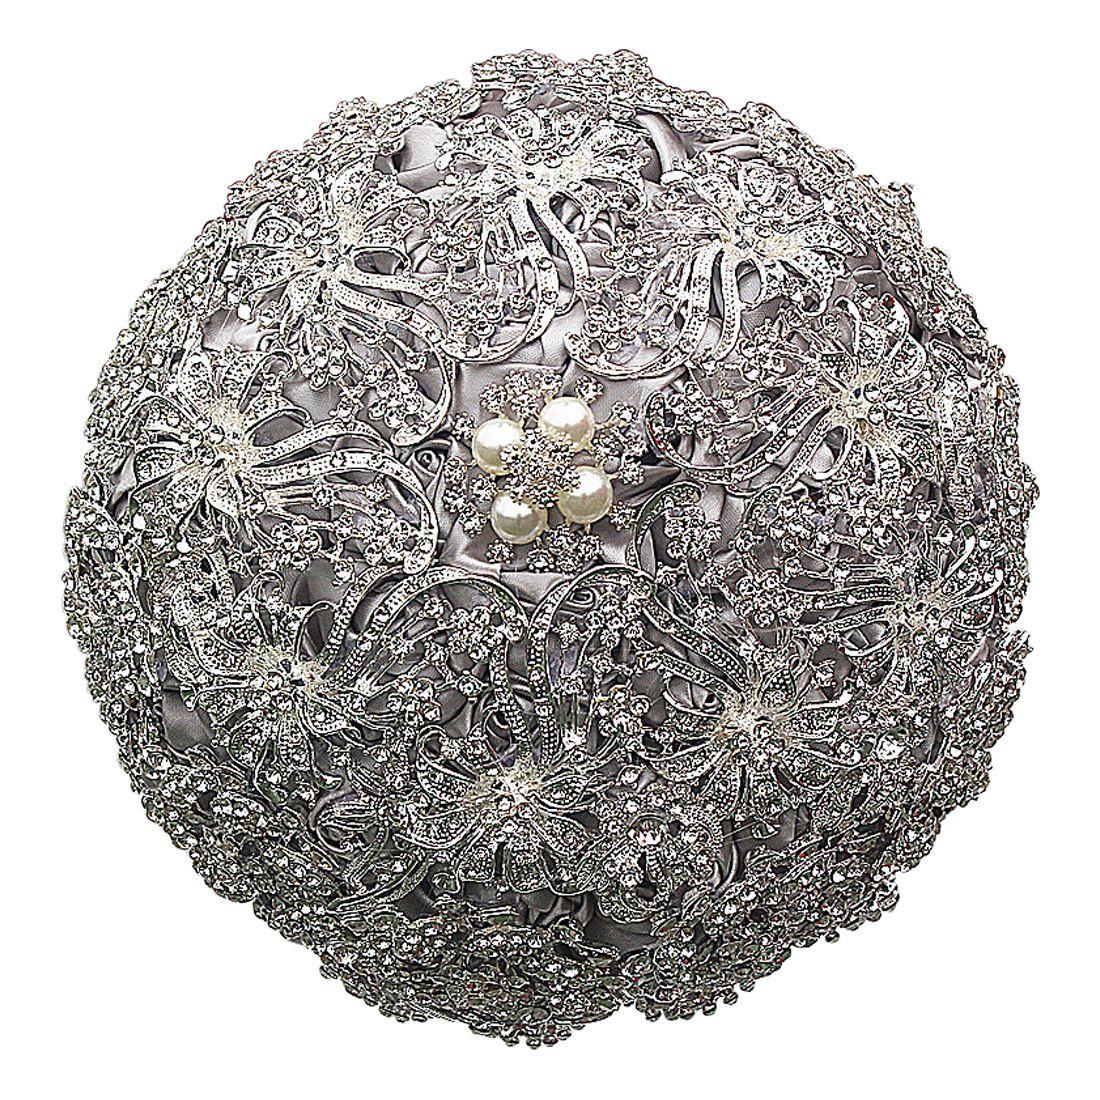 https://www.dhresource.com/0x0s/f2-albu-g7-M01-05-49-rBVaSVta3HOAGbTvAAx97LID0t4944.jpg/luxury-crystal-pearls-bridal-wedding-silver-flower-bouquet-brooch-bride-hand-flowers-wedding-favors-hand-holding-decoration-handmade.jpg